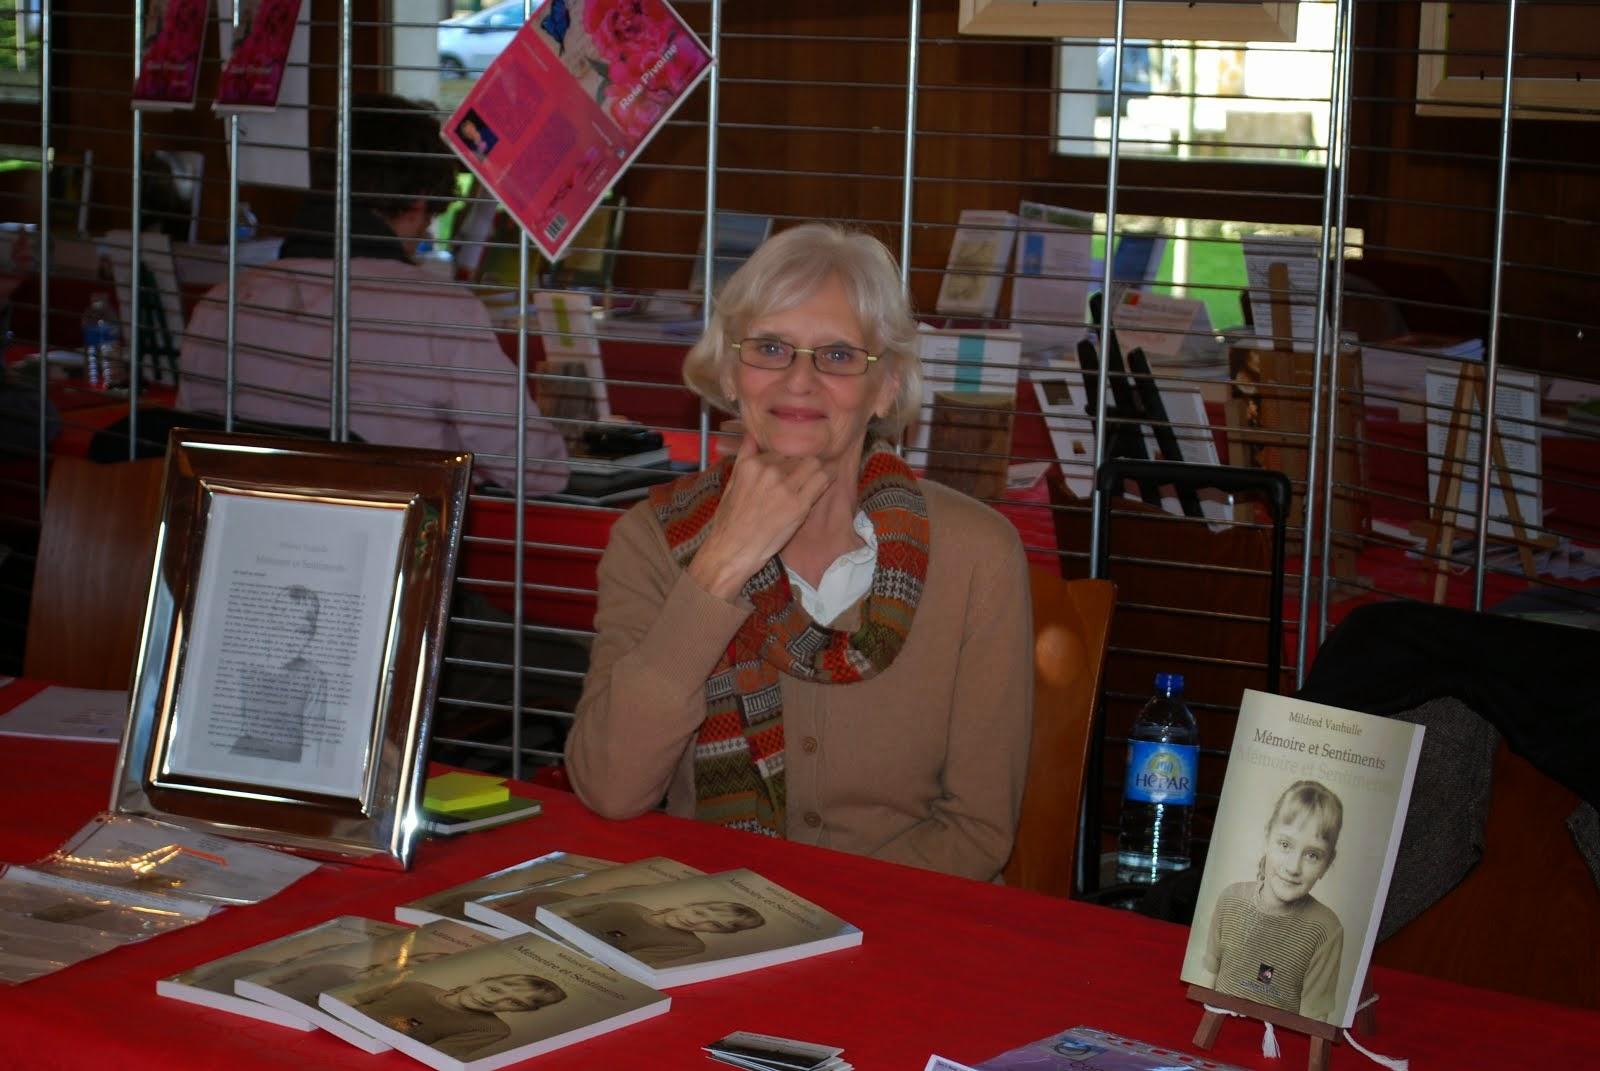 Mildred Vanhulle